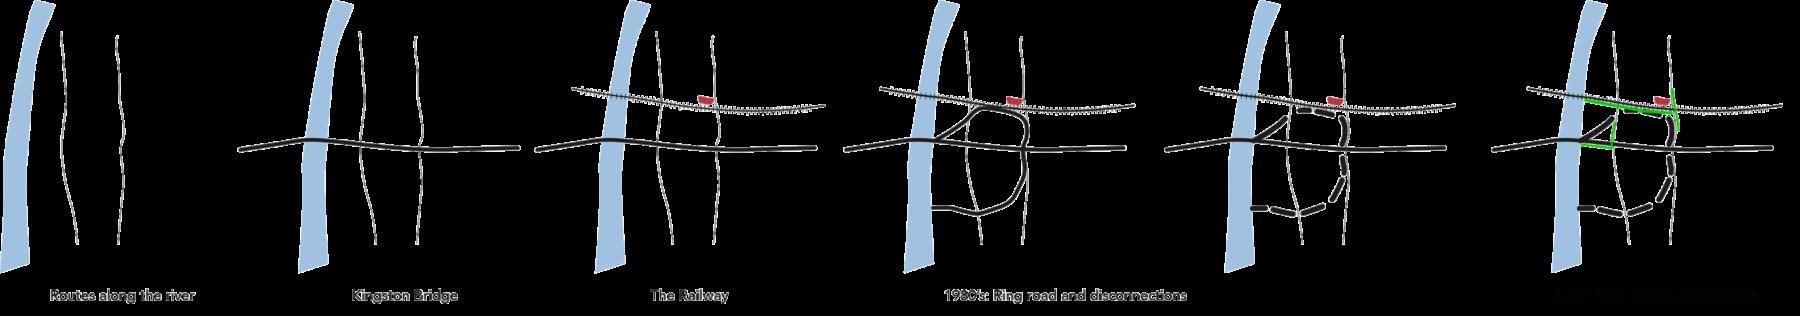 Sarah-Wigglesworth-Architects Kingston-Mini-Holland Context Transport-Patterns2 3600